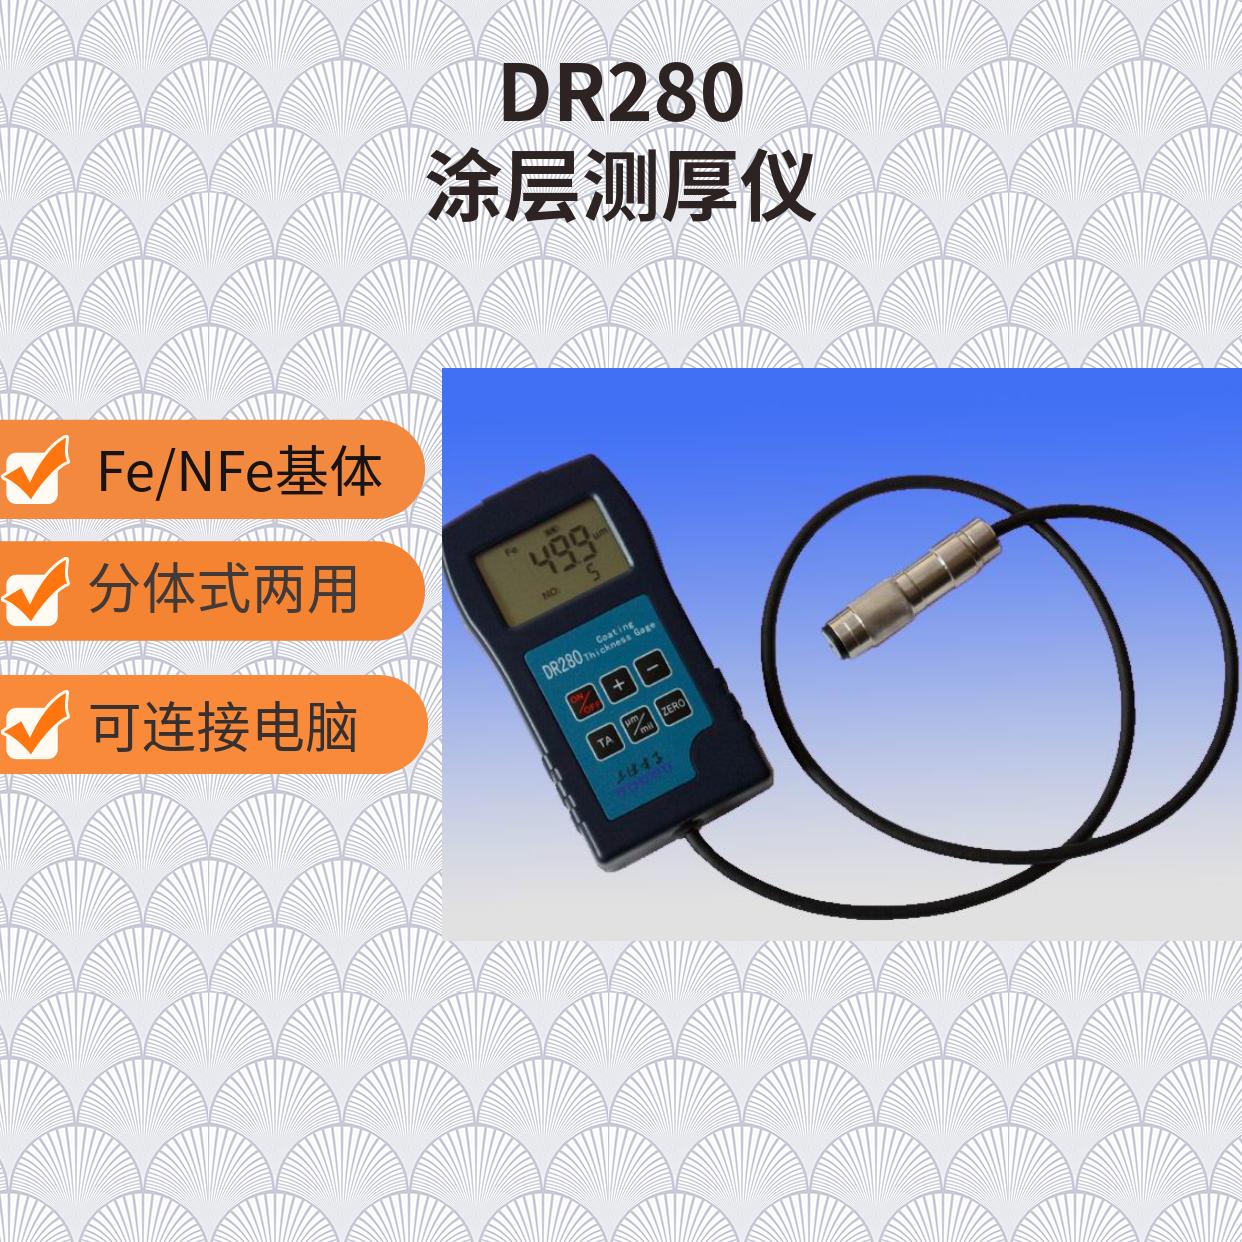 DR280 两用膜厚仪 选配主机可连接电脑